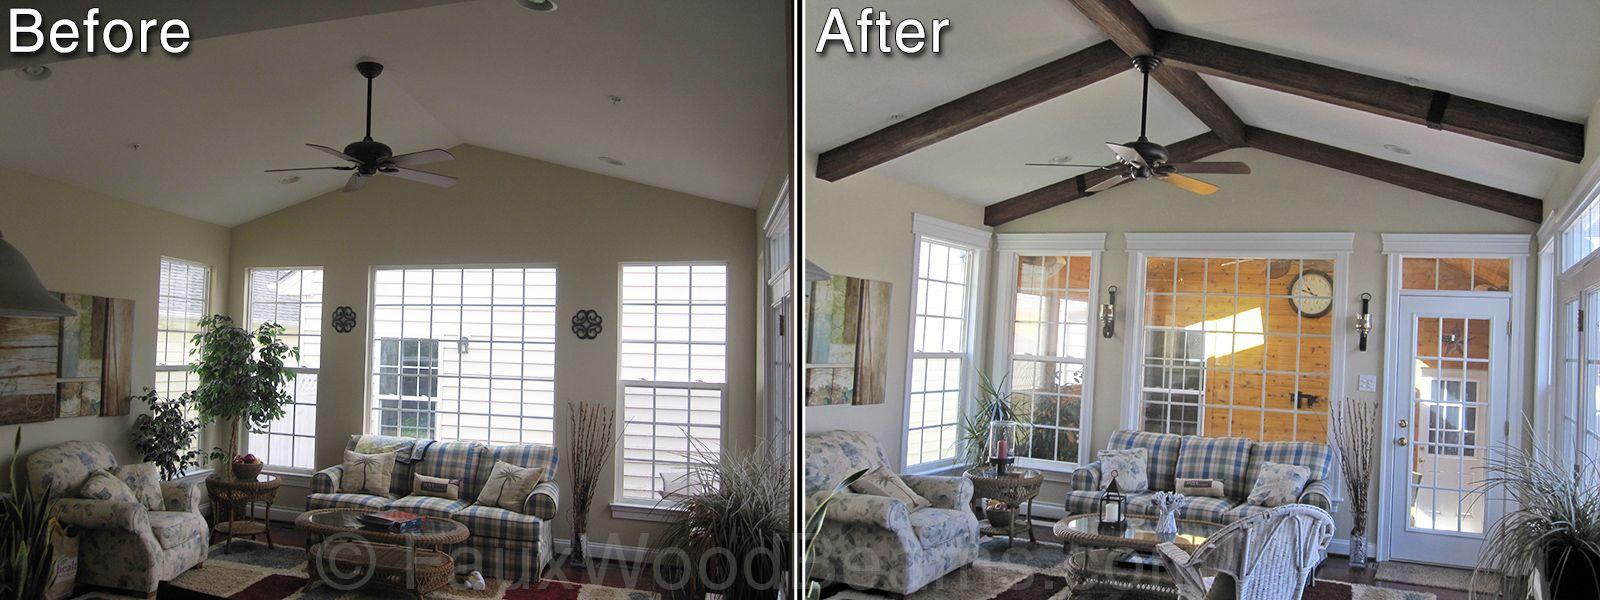 Vaulted Ceiling Home Design Ideas | Ceiling Beam Photos